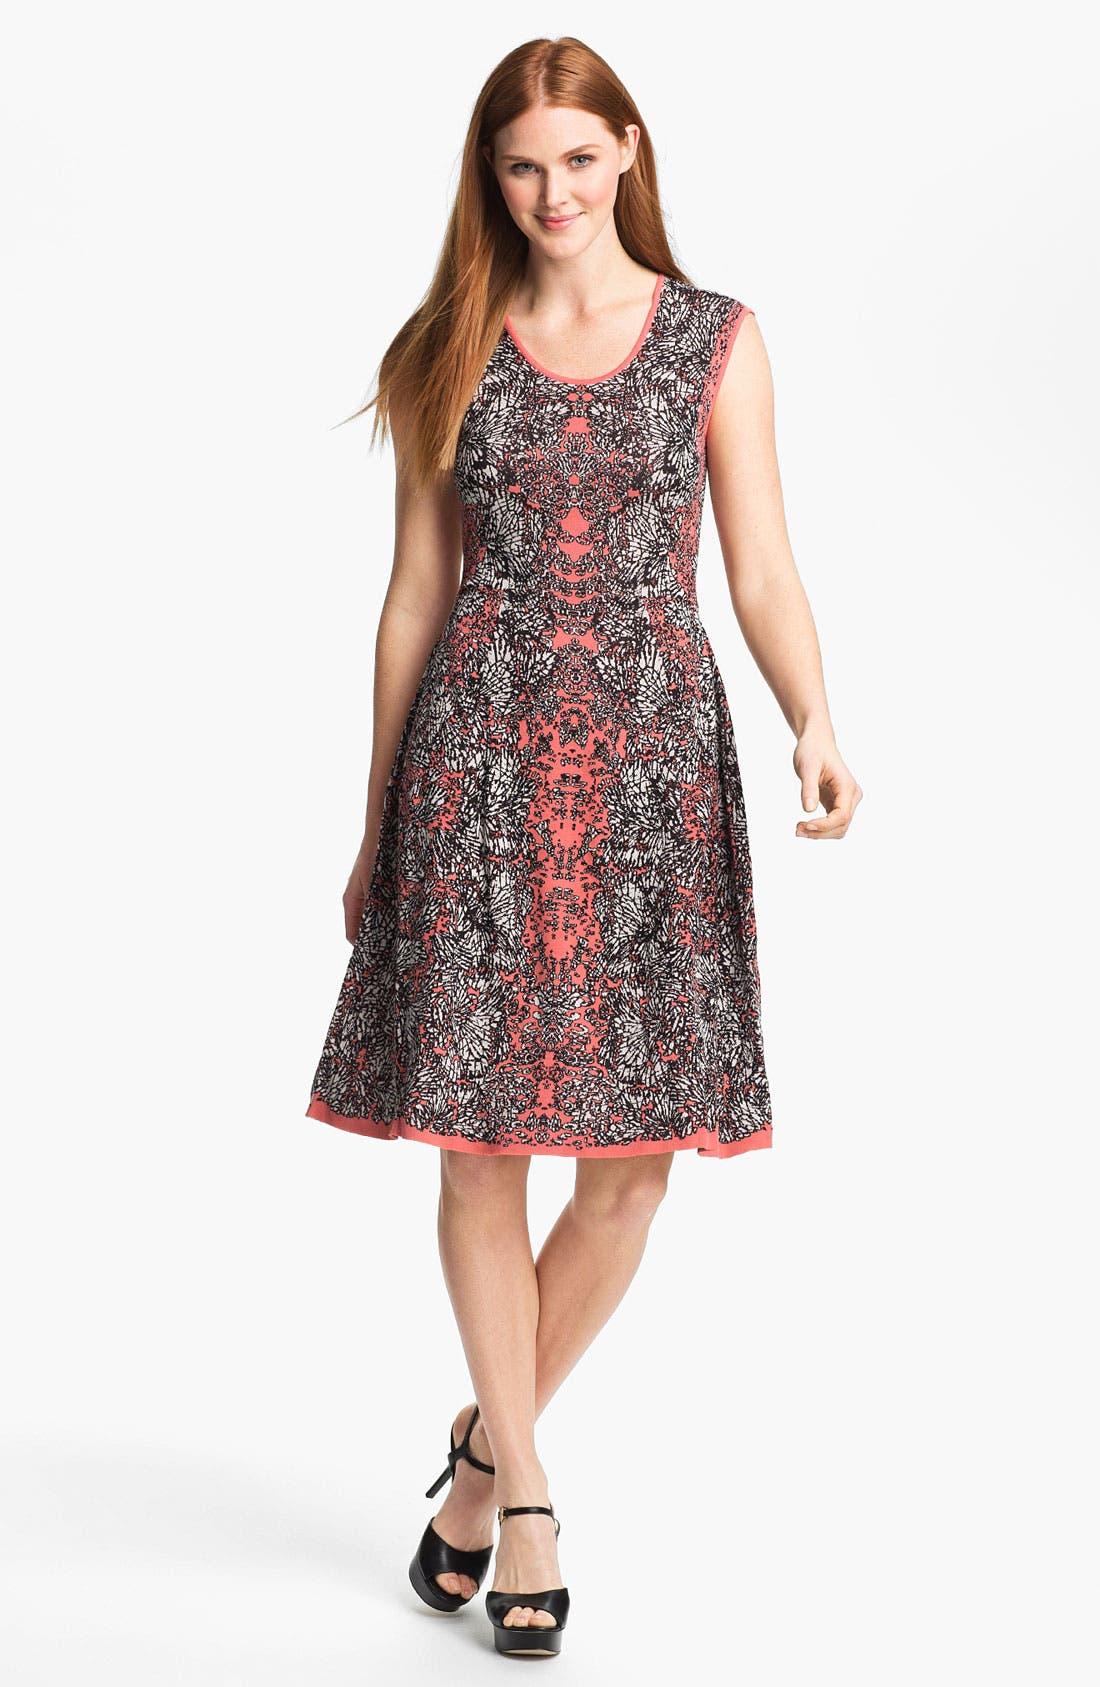 Alternate Image 1 Selected - Nic + Zoe 'Peeking Out' Print Dress